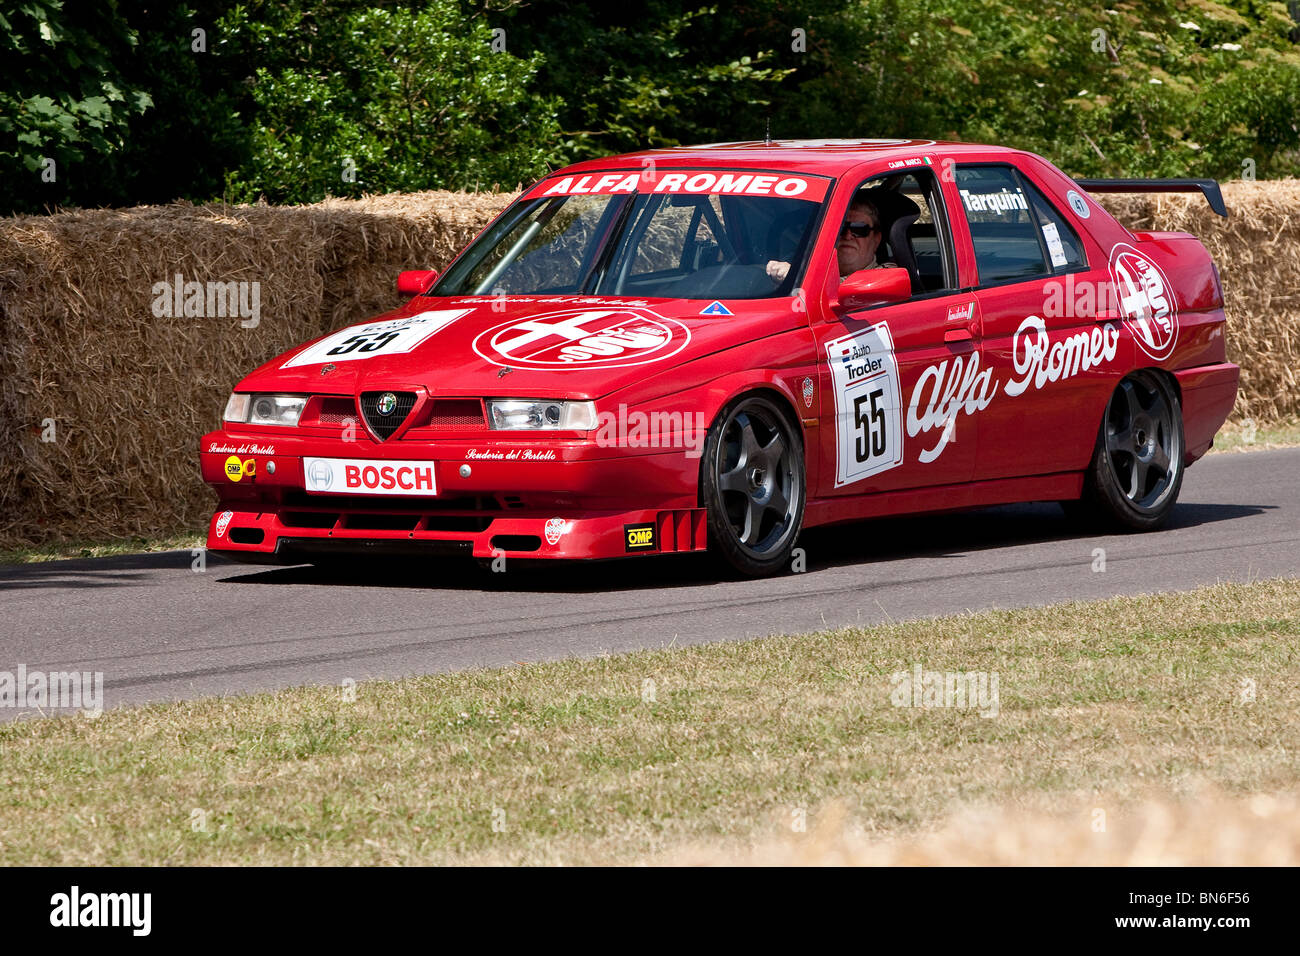 1994 Alfa Romeo 155 TS at the Festival of Speed, Goodwood, 2010 - Stock Image